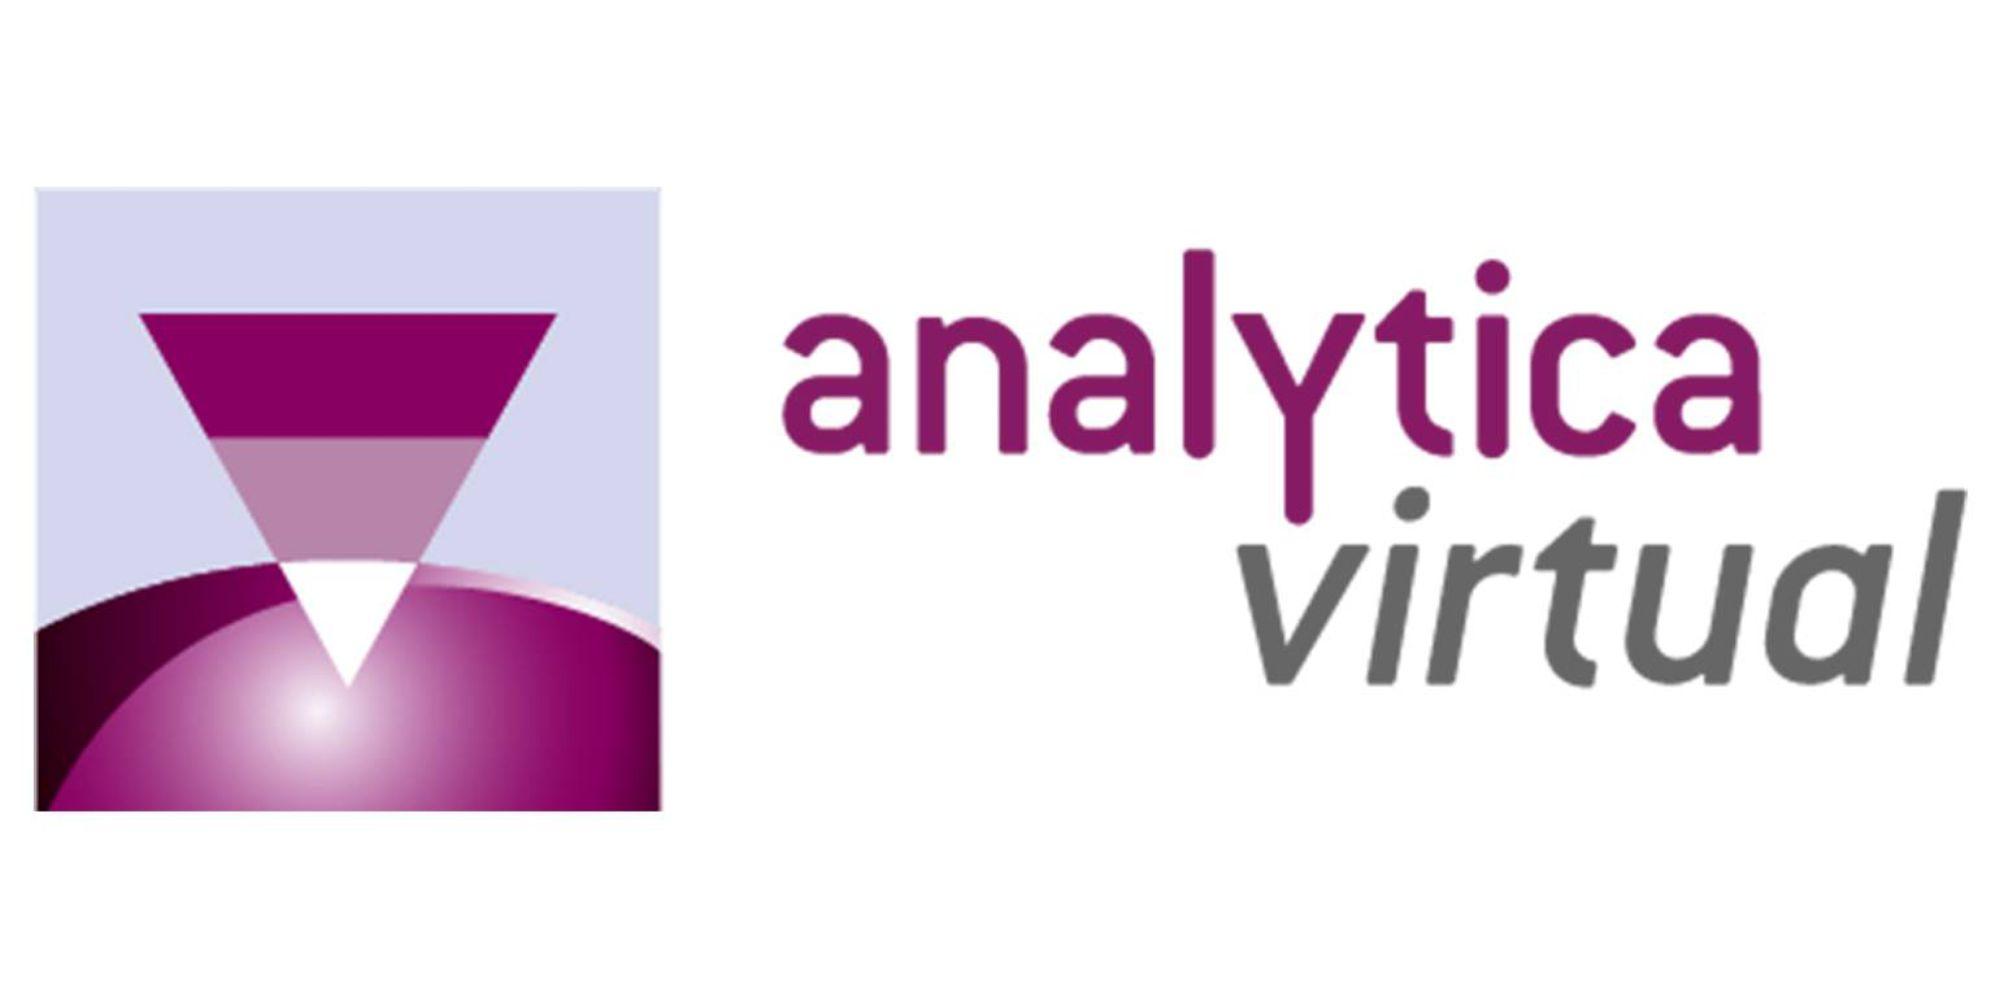 analytica virtual 2020